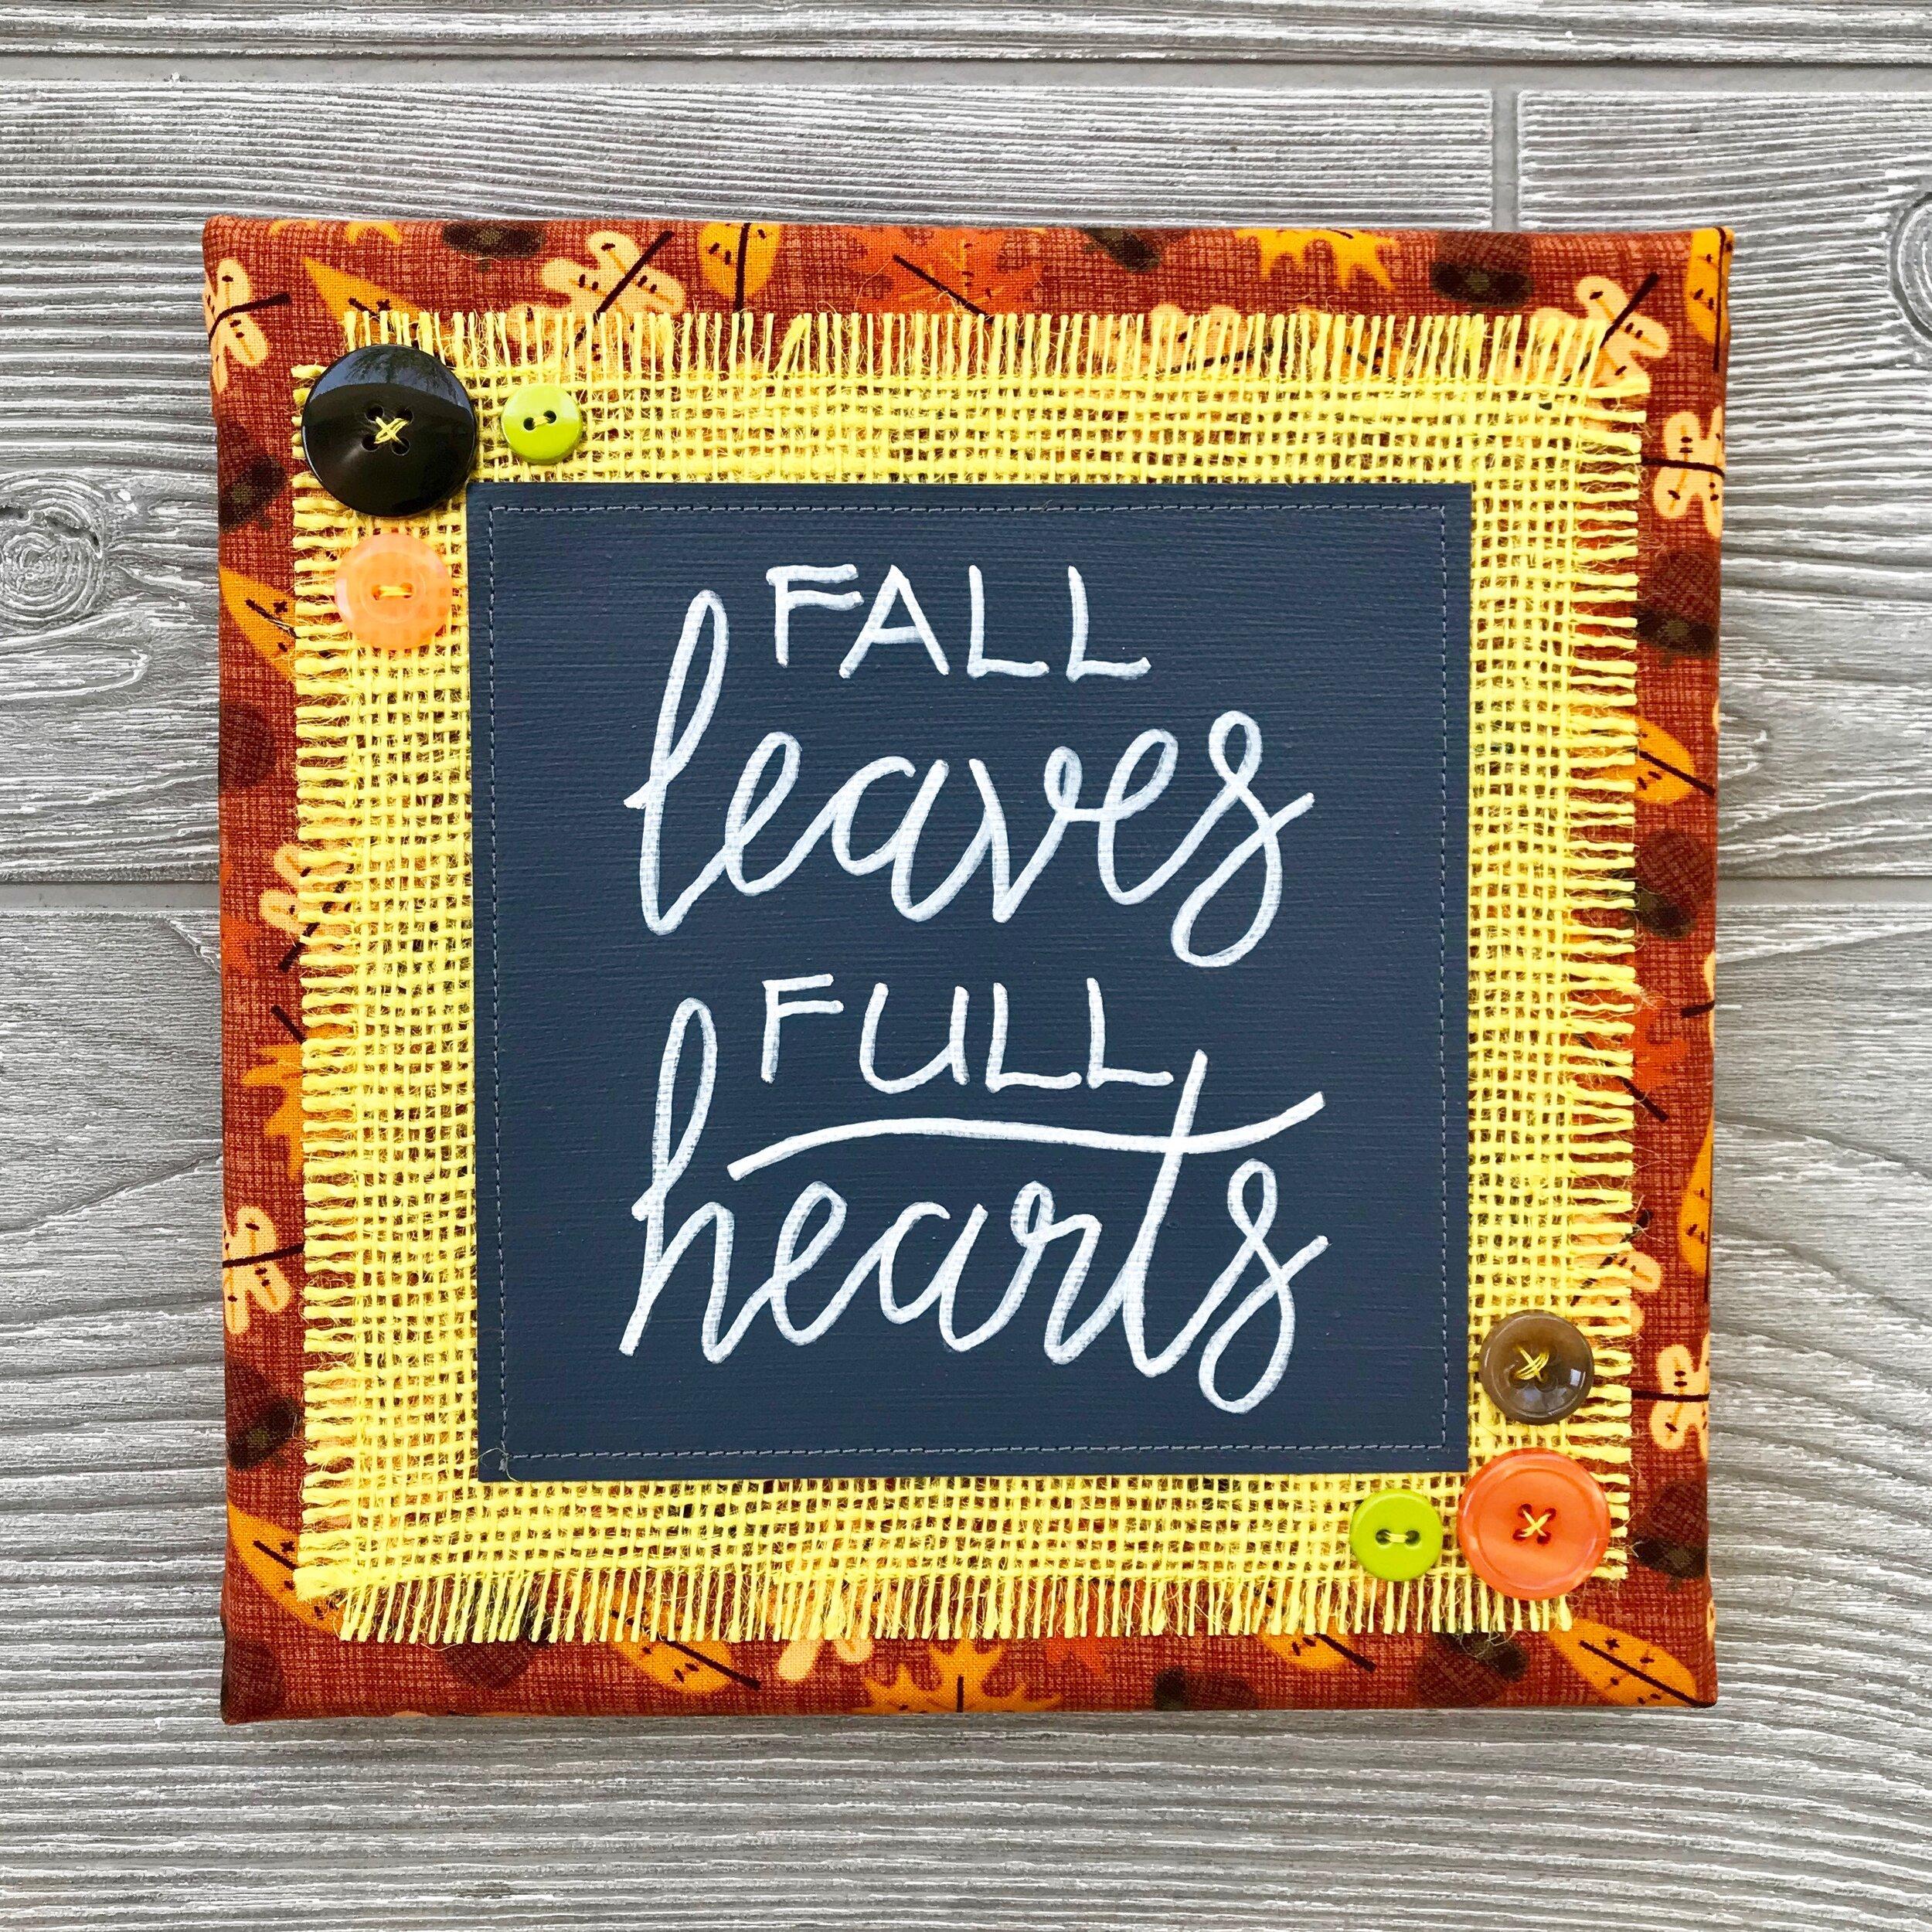 "Fall Leaves Full Hearts  Handmade Artwork – 8""x8"""